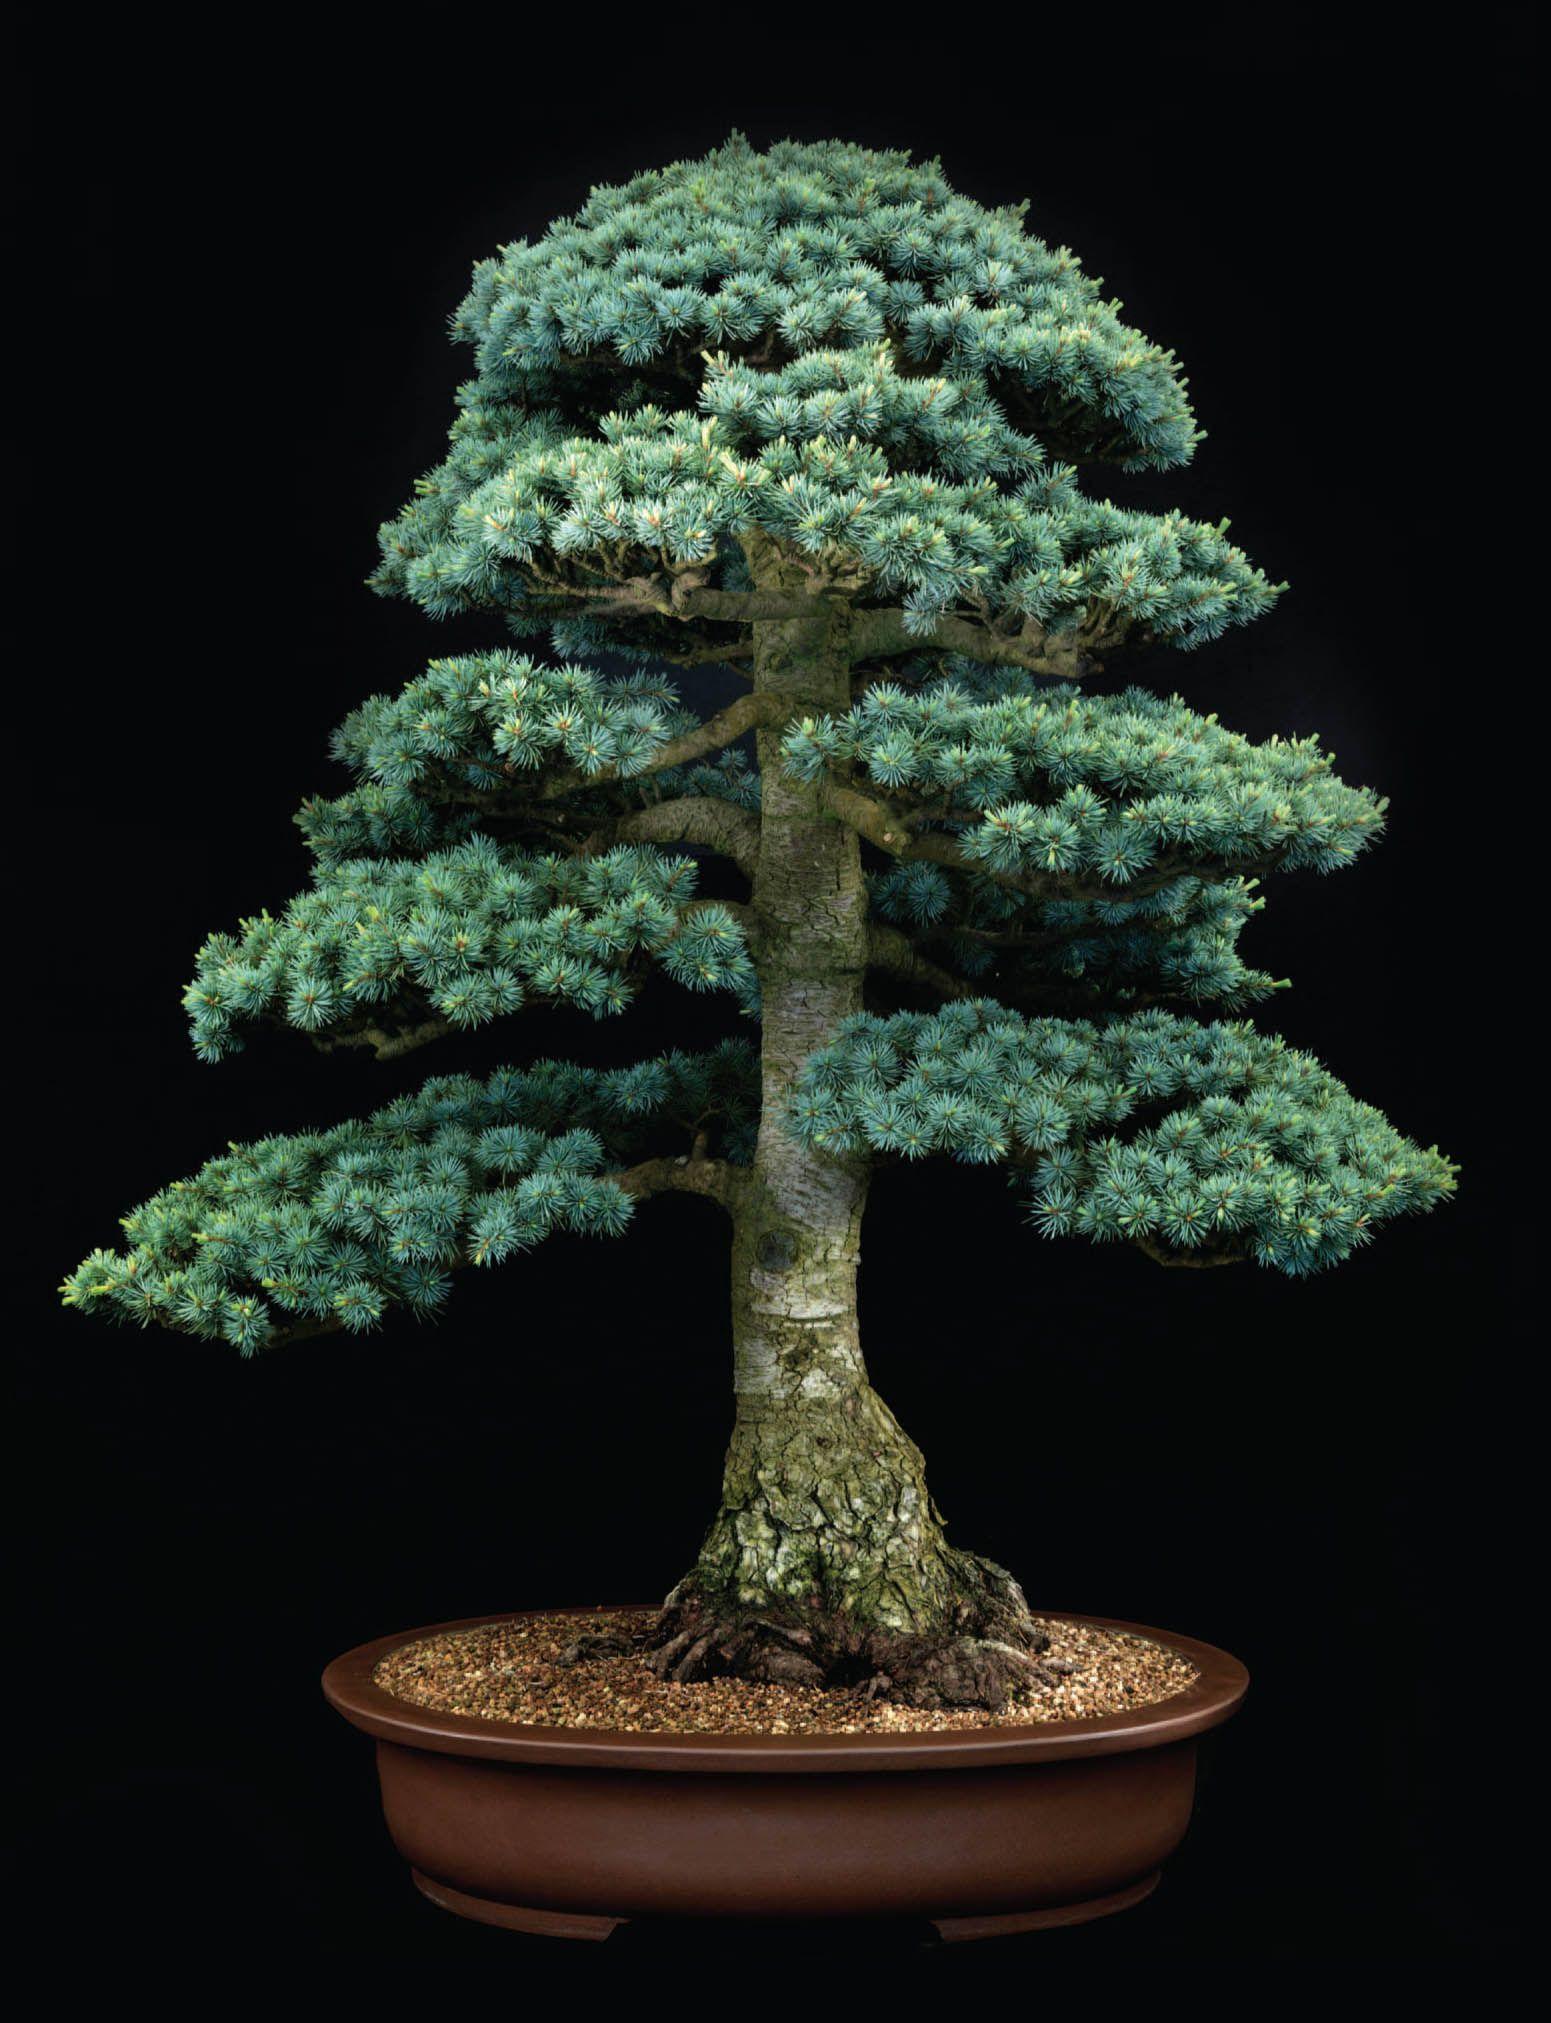 Bonsai As Natural History Shaped By Artists Bonsai Tree